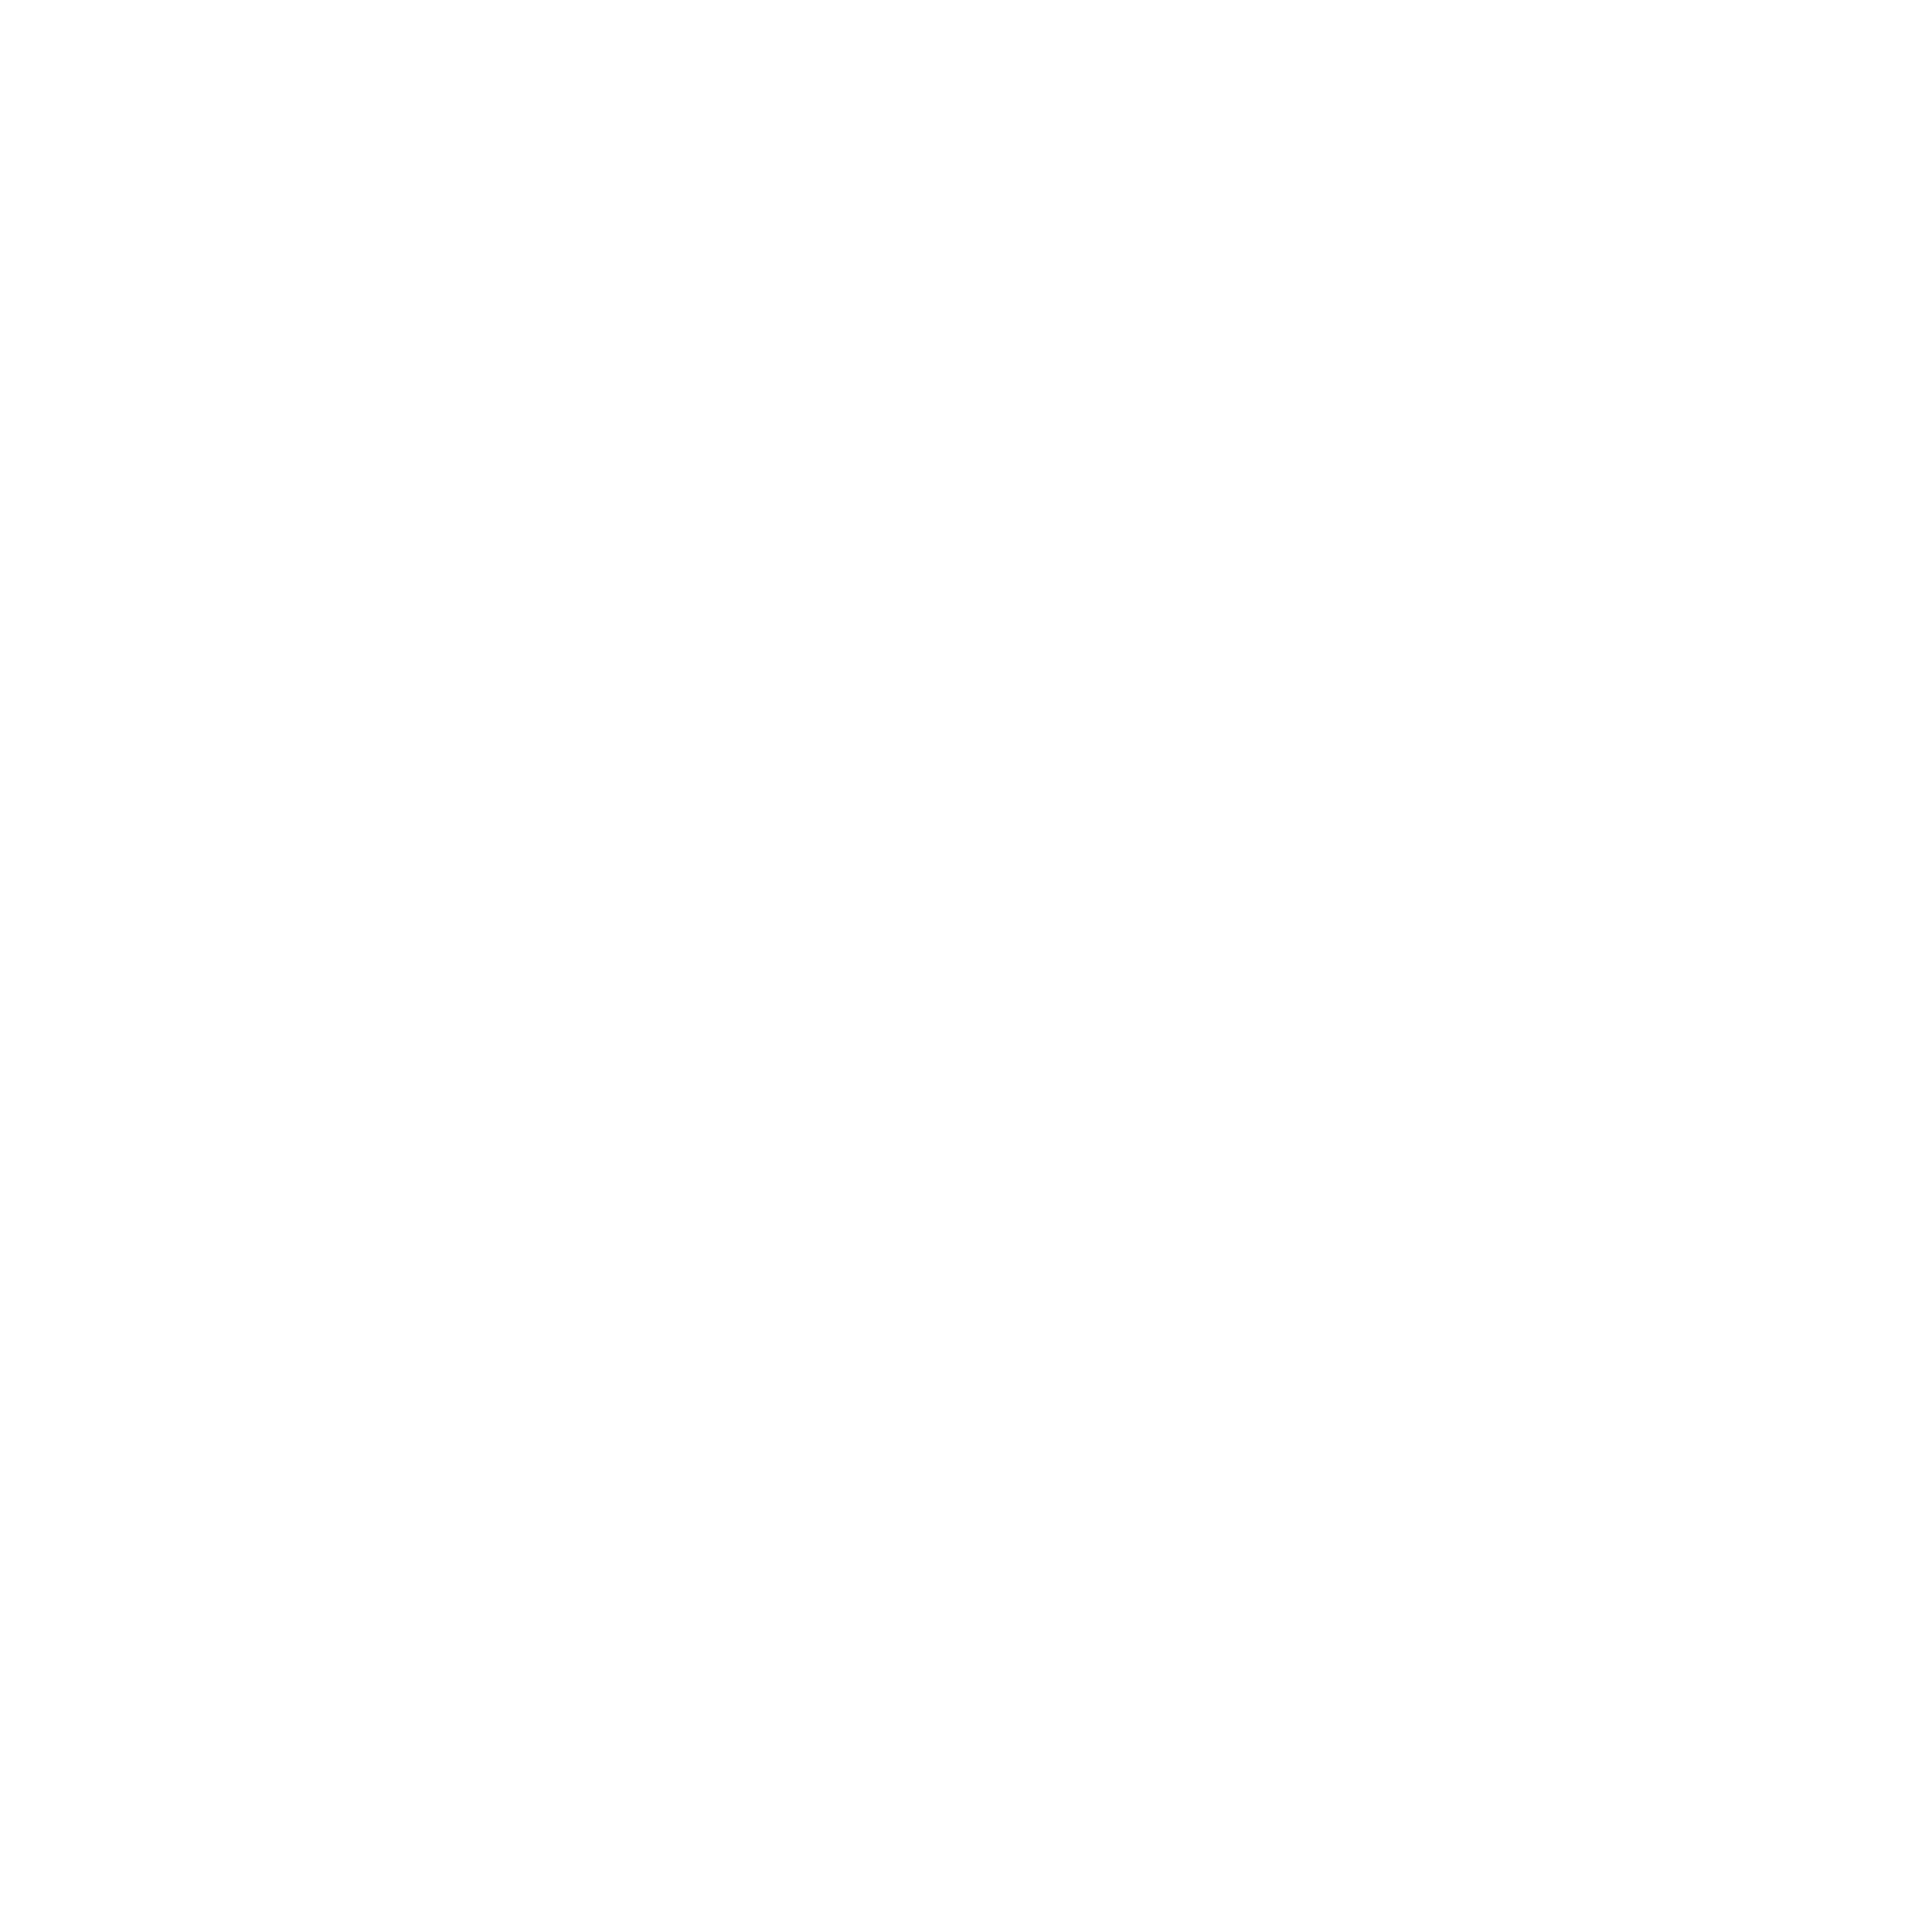 ECON_Full_LogoArtboard 1 copy 2.png